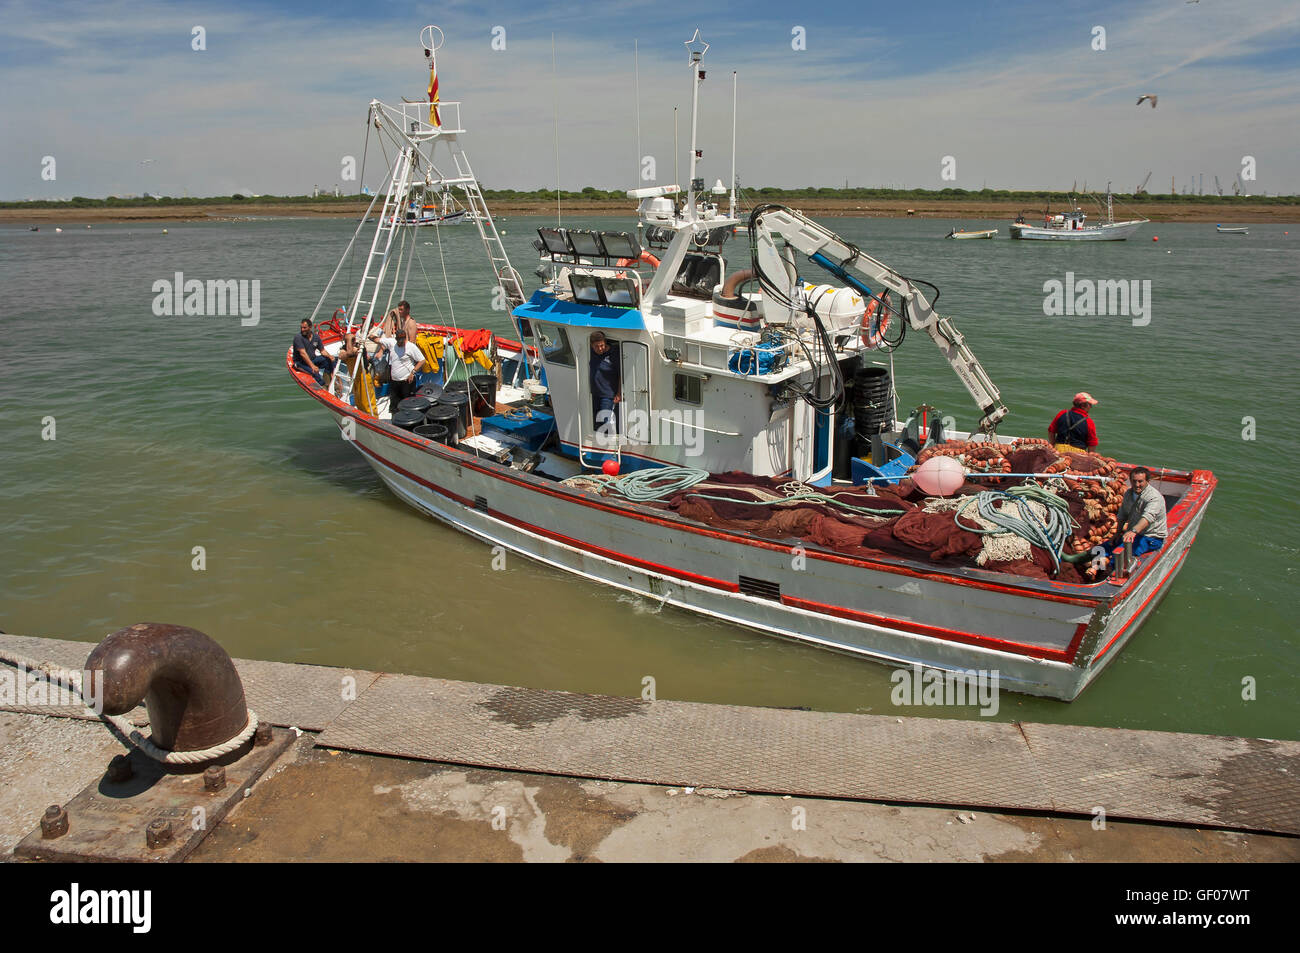 Puerto pesquero, Punta Umbría, Huelva, provincia, región de Andalucía, España, Europa Foto de stock